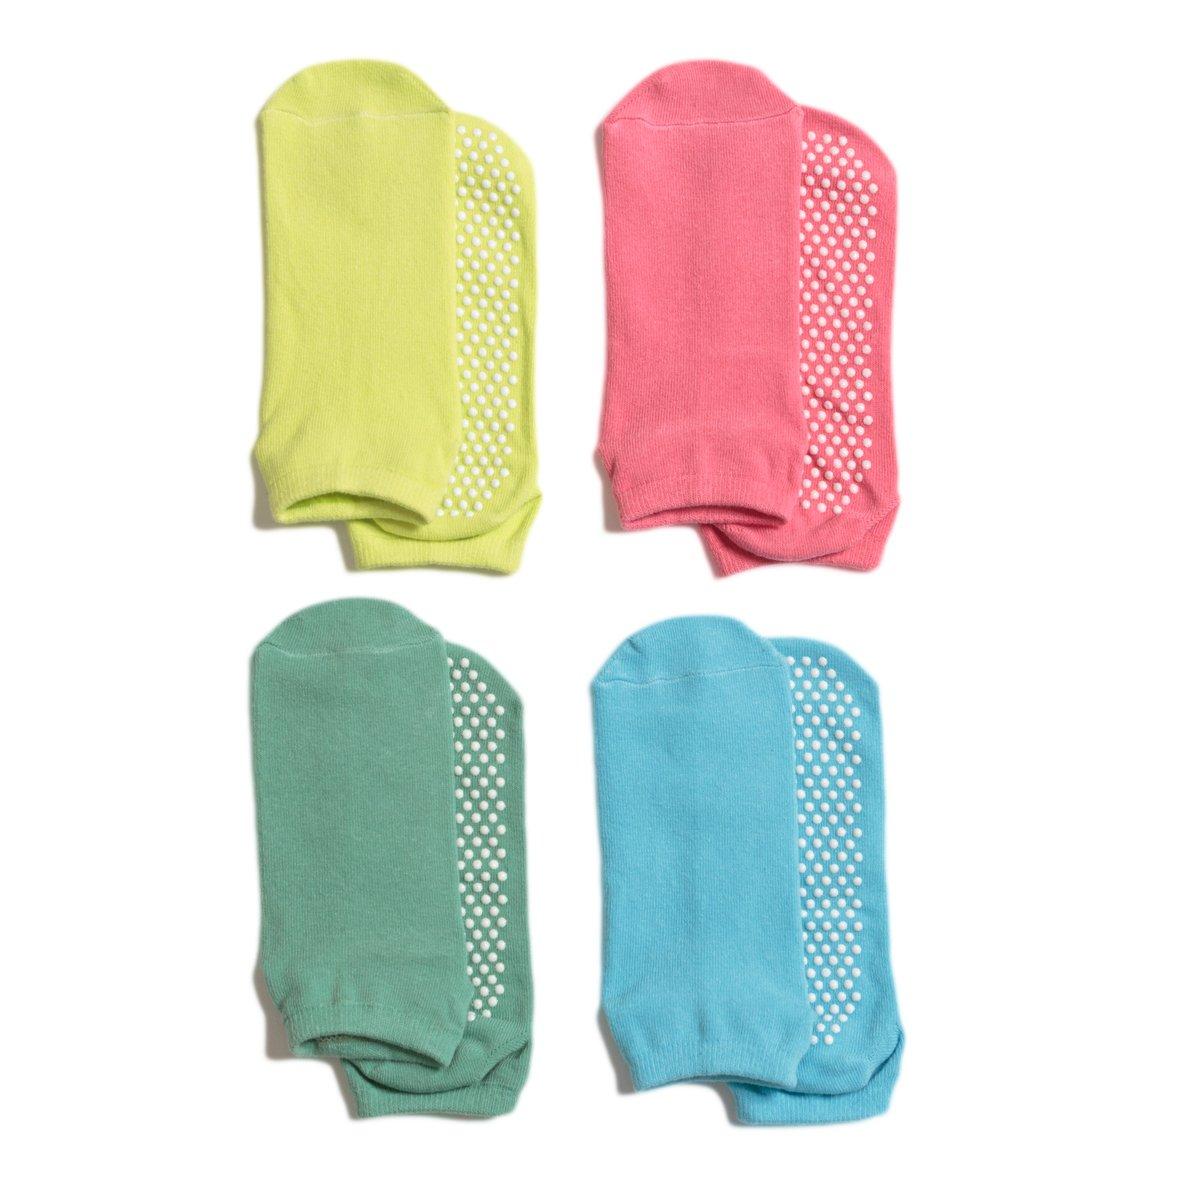 LIBRUONE Yoga Socks Non Slip Skid Pilates Barre Ballet Socks with Grips Cotton for Women